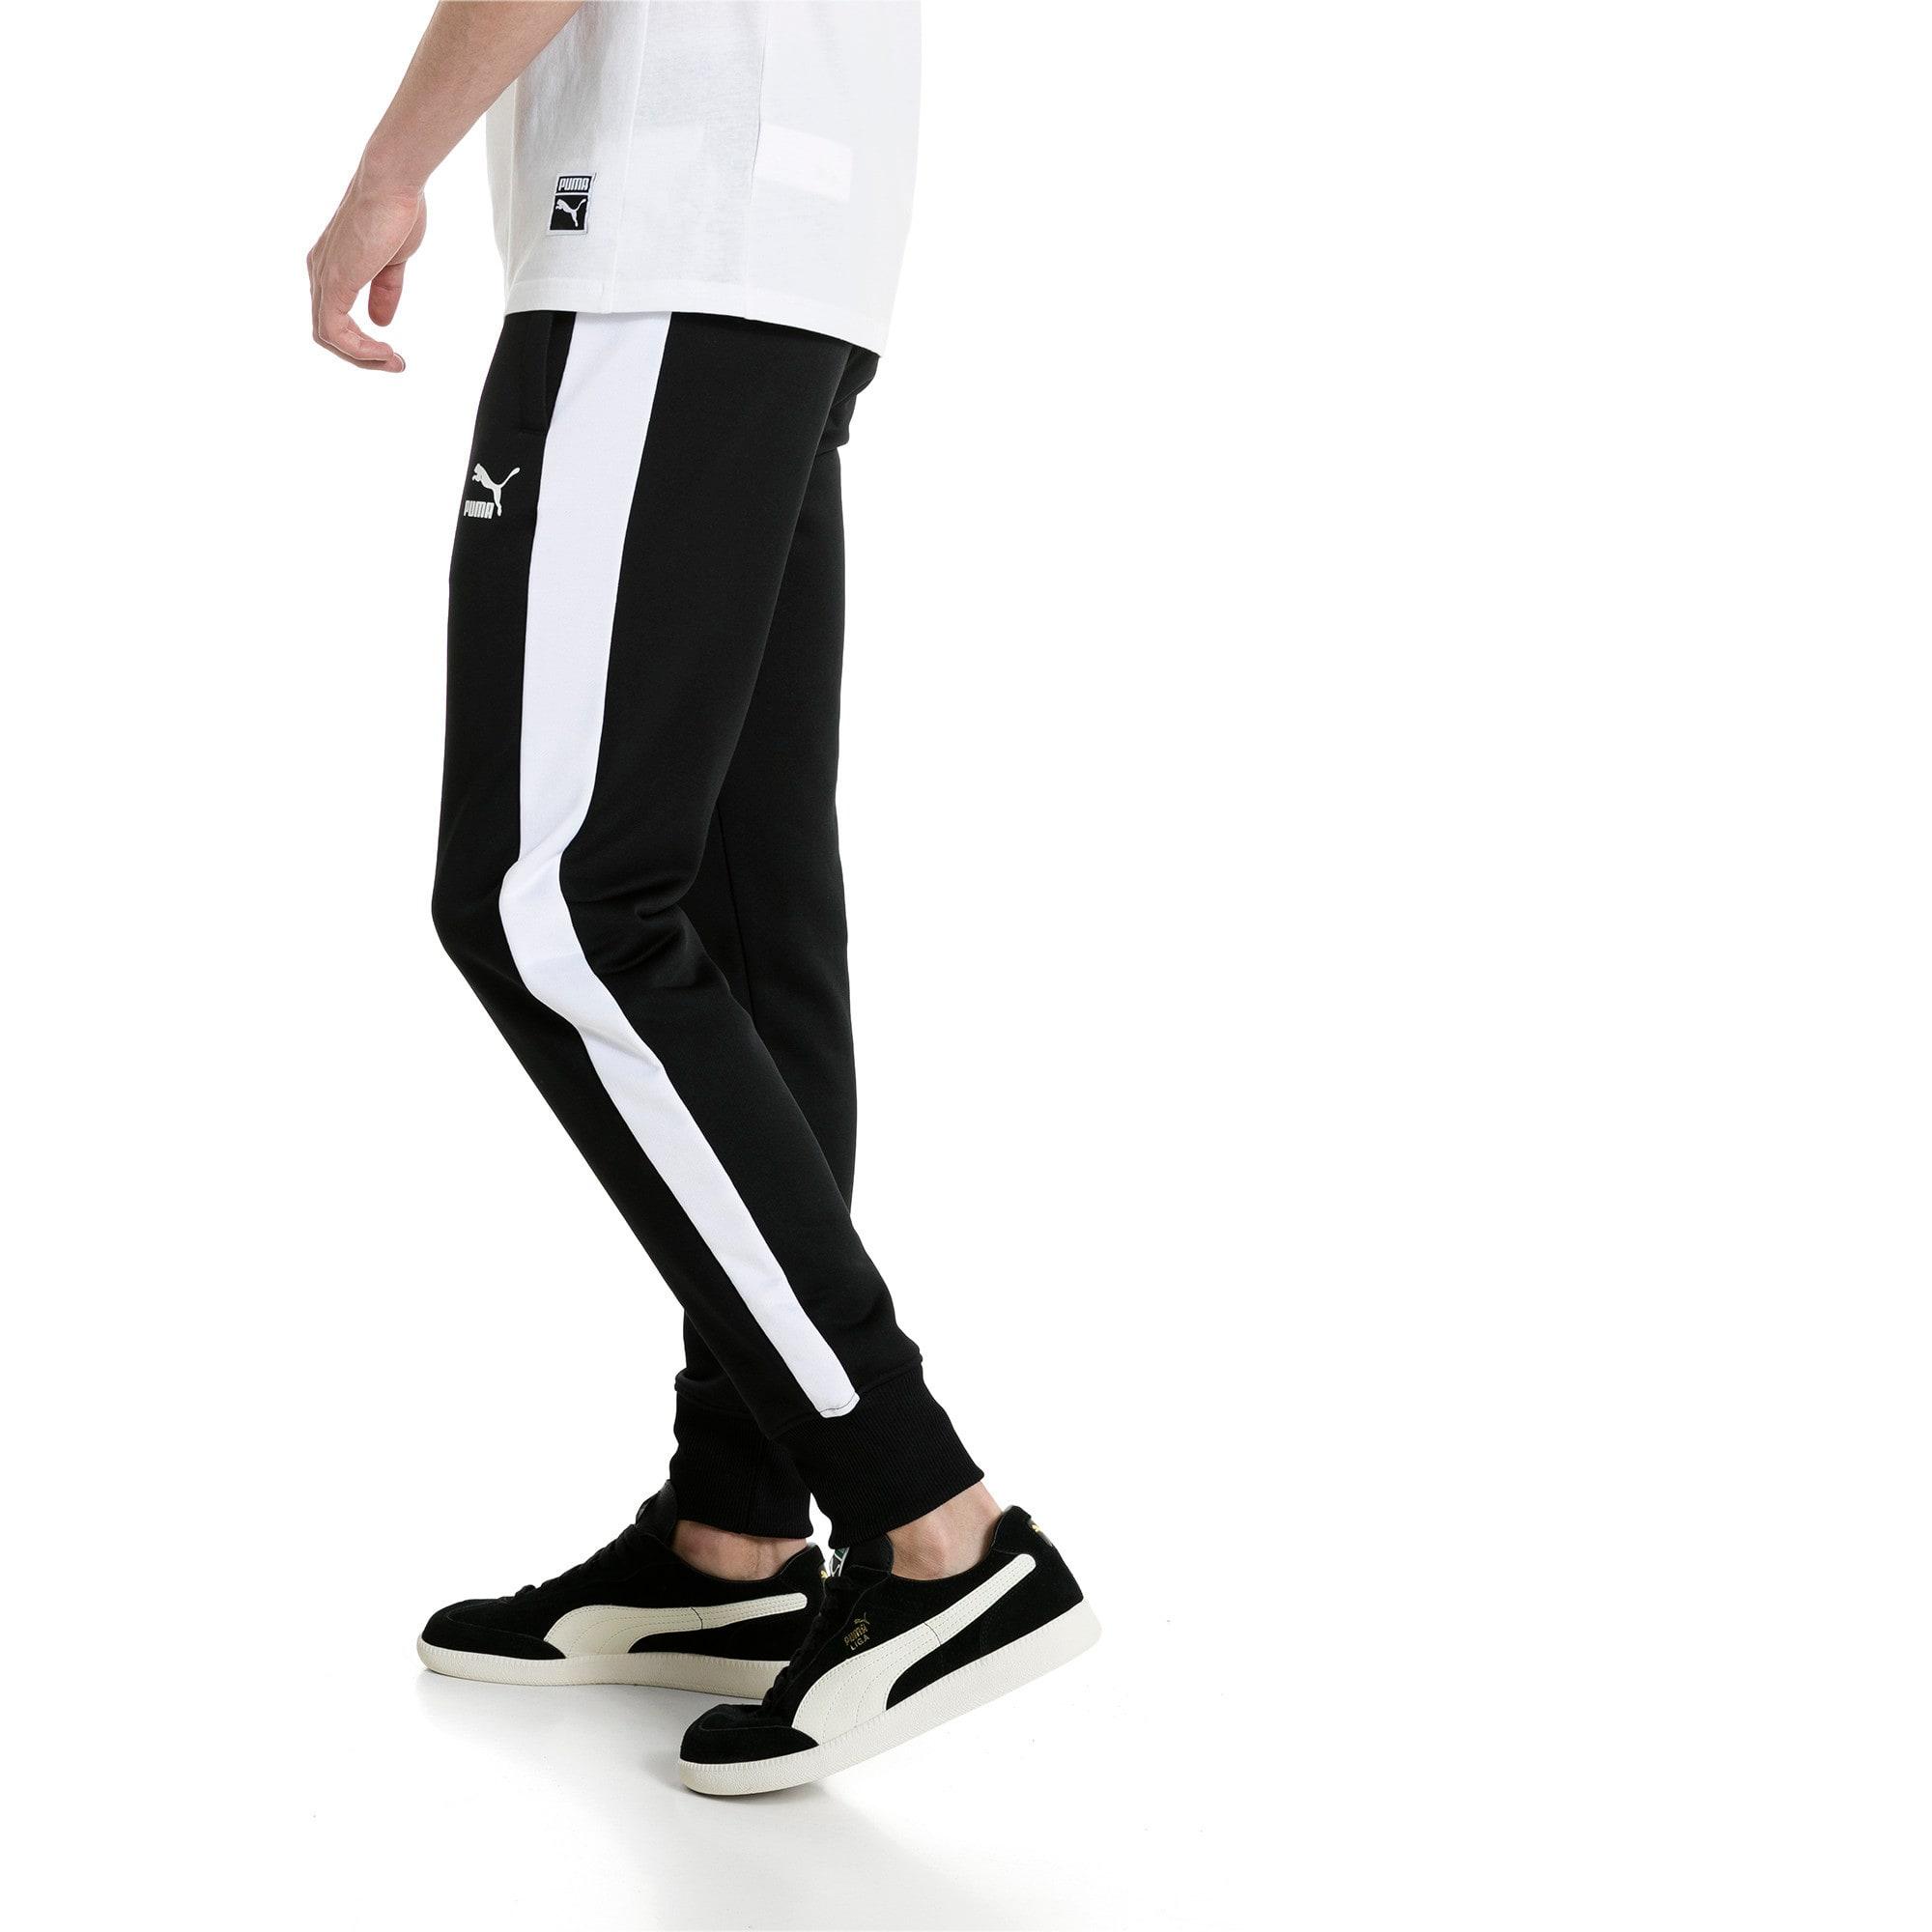 Thumbnail 2 of Archive Men's T7 Track Pants, Puma Black, medium-IND